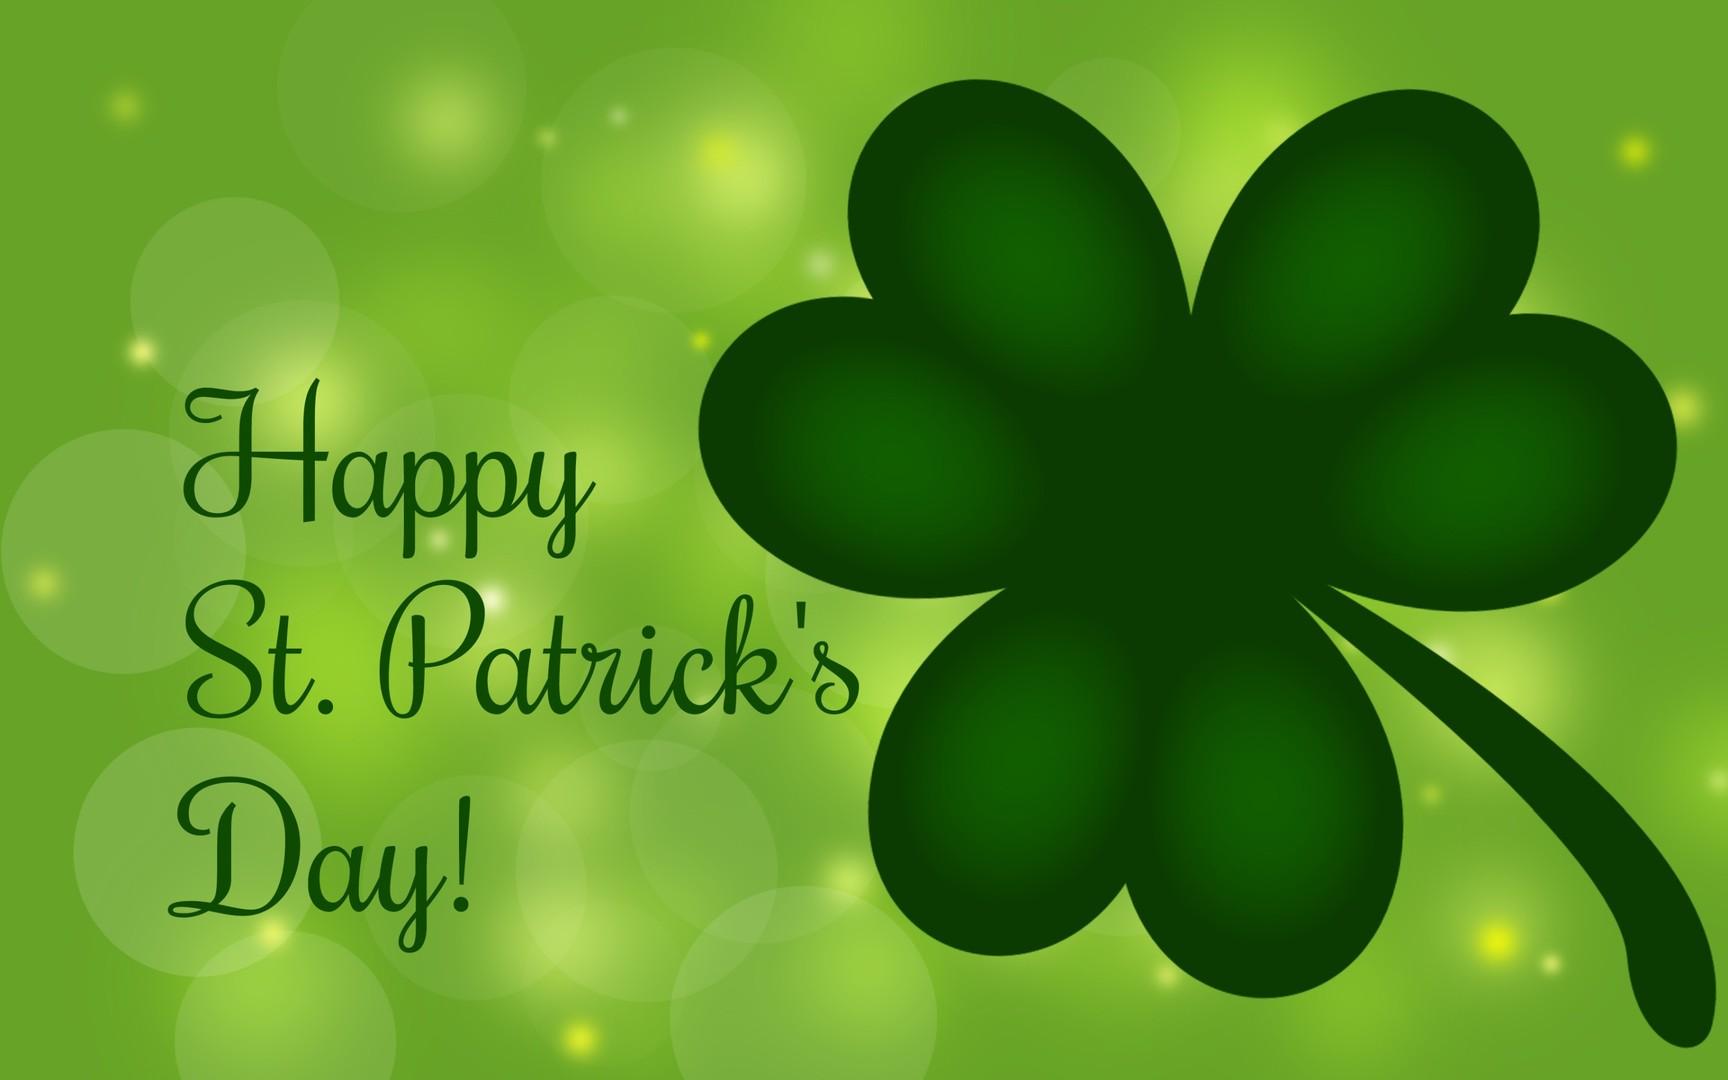 Happy Saint Patricks Day wallpaper 19717 1728x1080